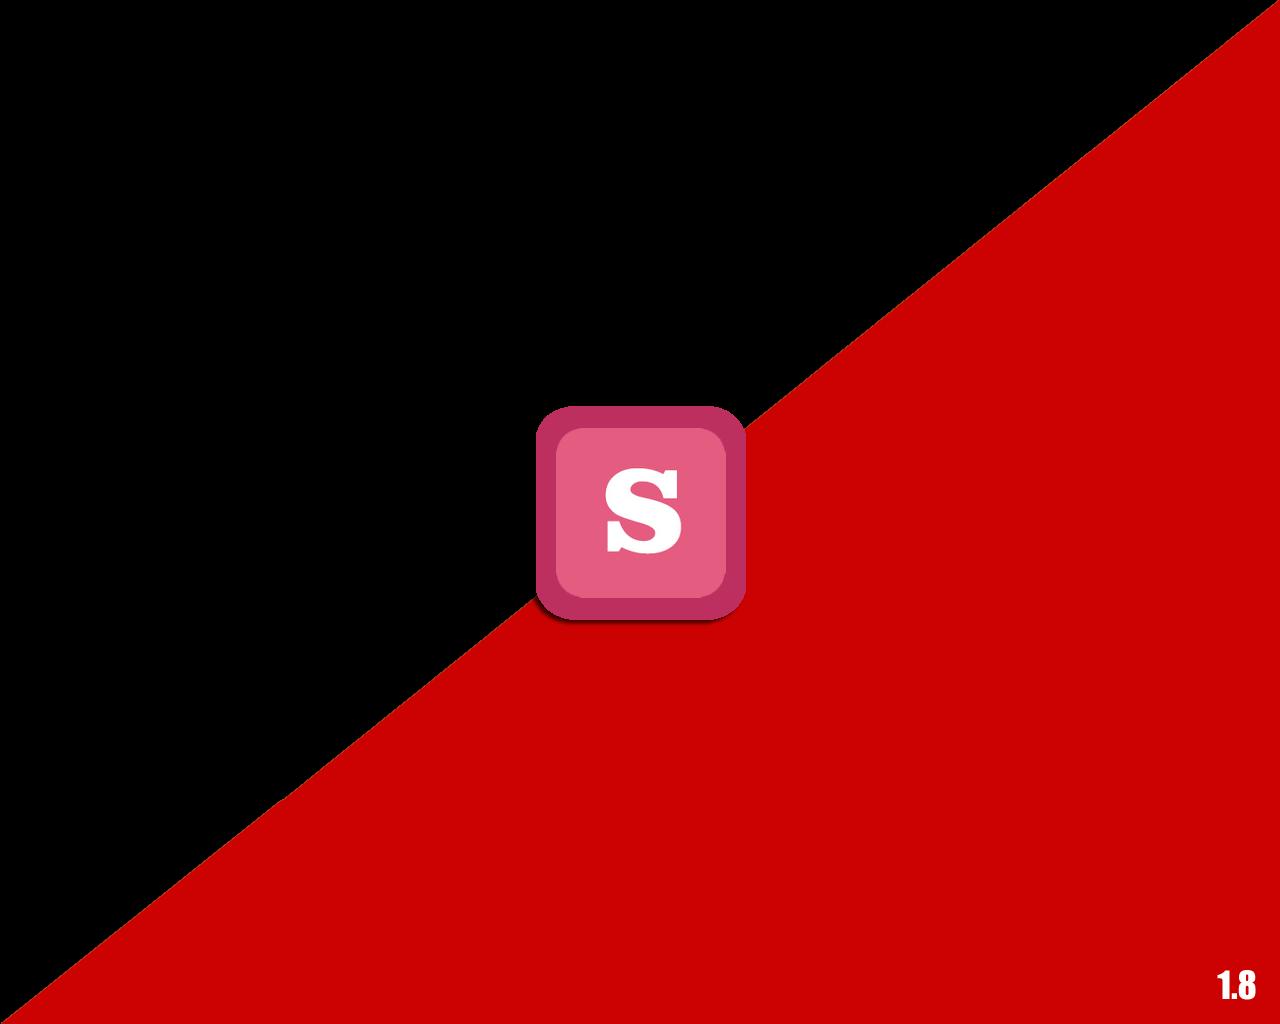 Latest Simontok Version 1 8 Terbaru Download Apk For Android Karajuki Android Apps Free Android App